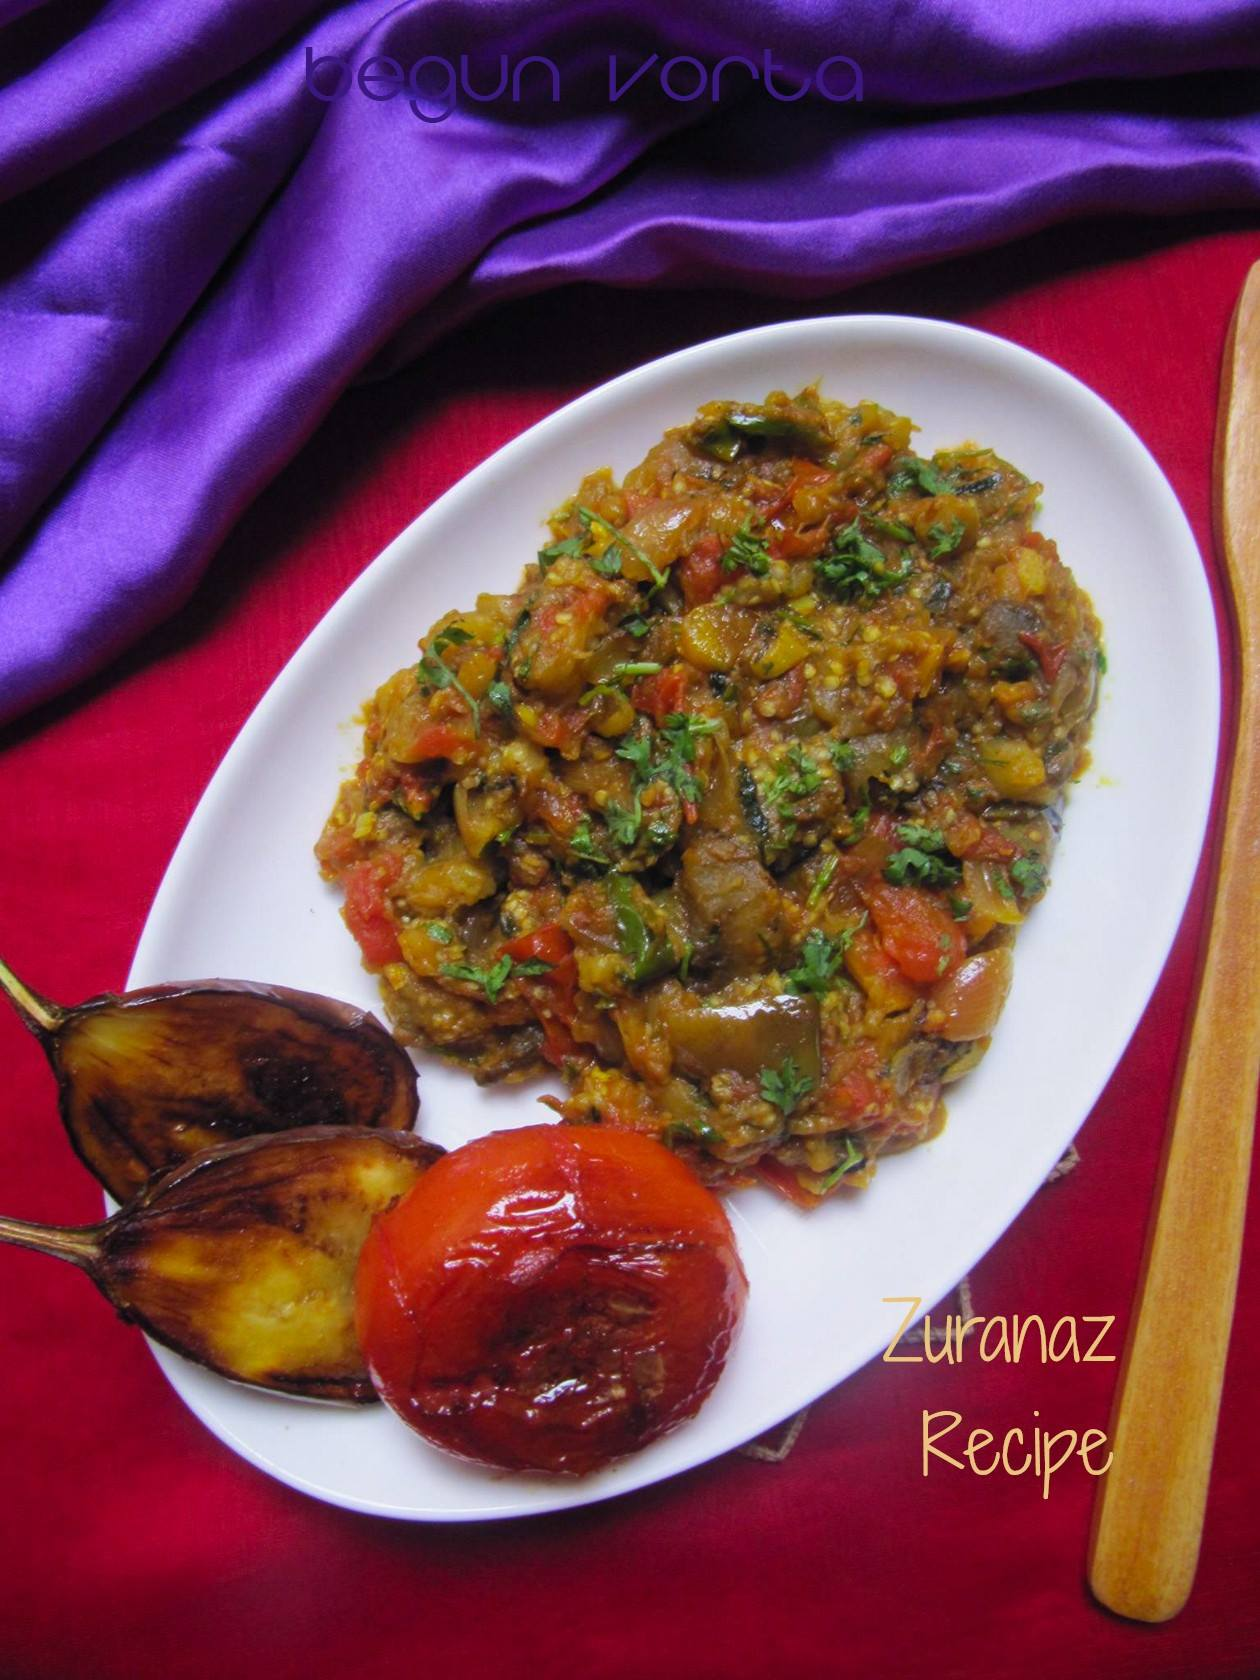 Begun Bhorta/Spicy Begun Bhorta/Spicy Mashed Eggplant/Brinjal Bhorta